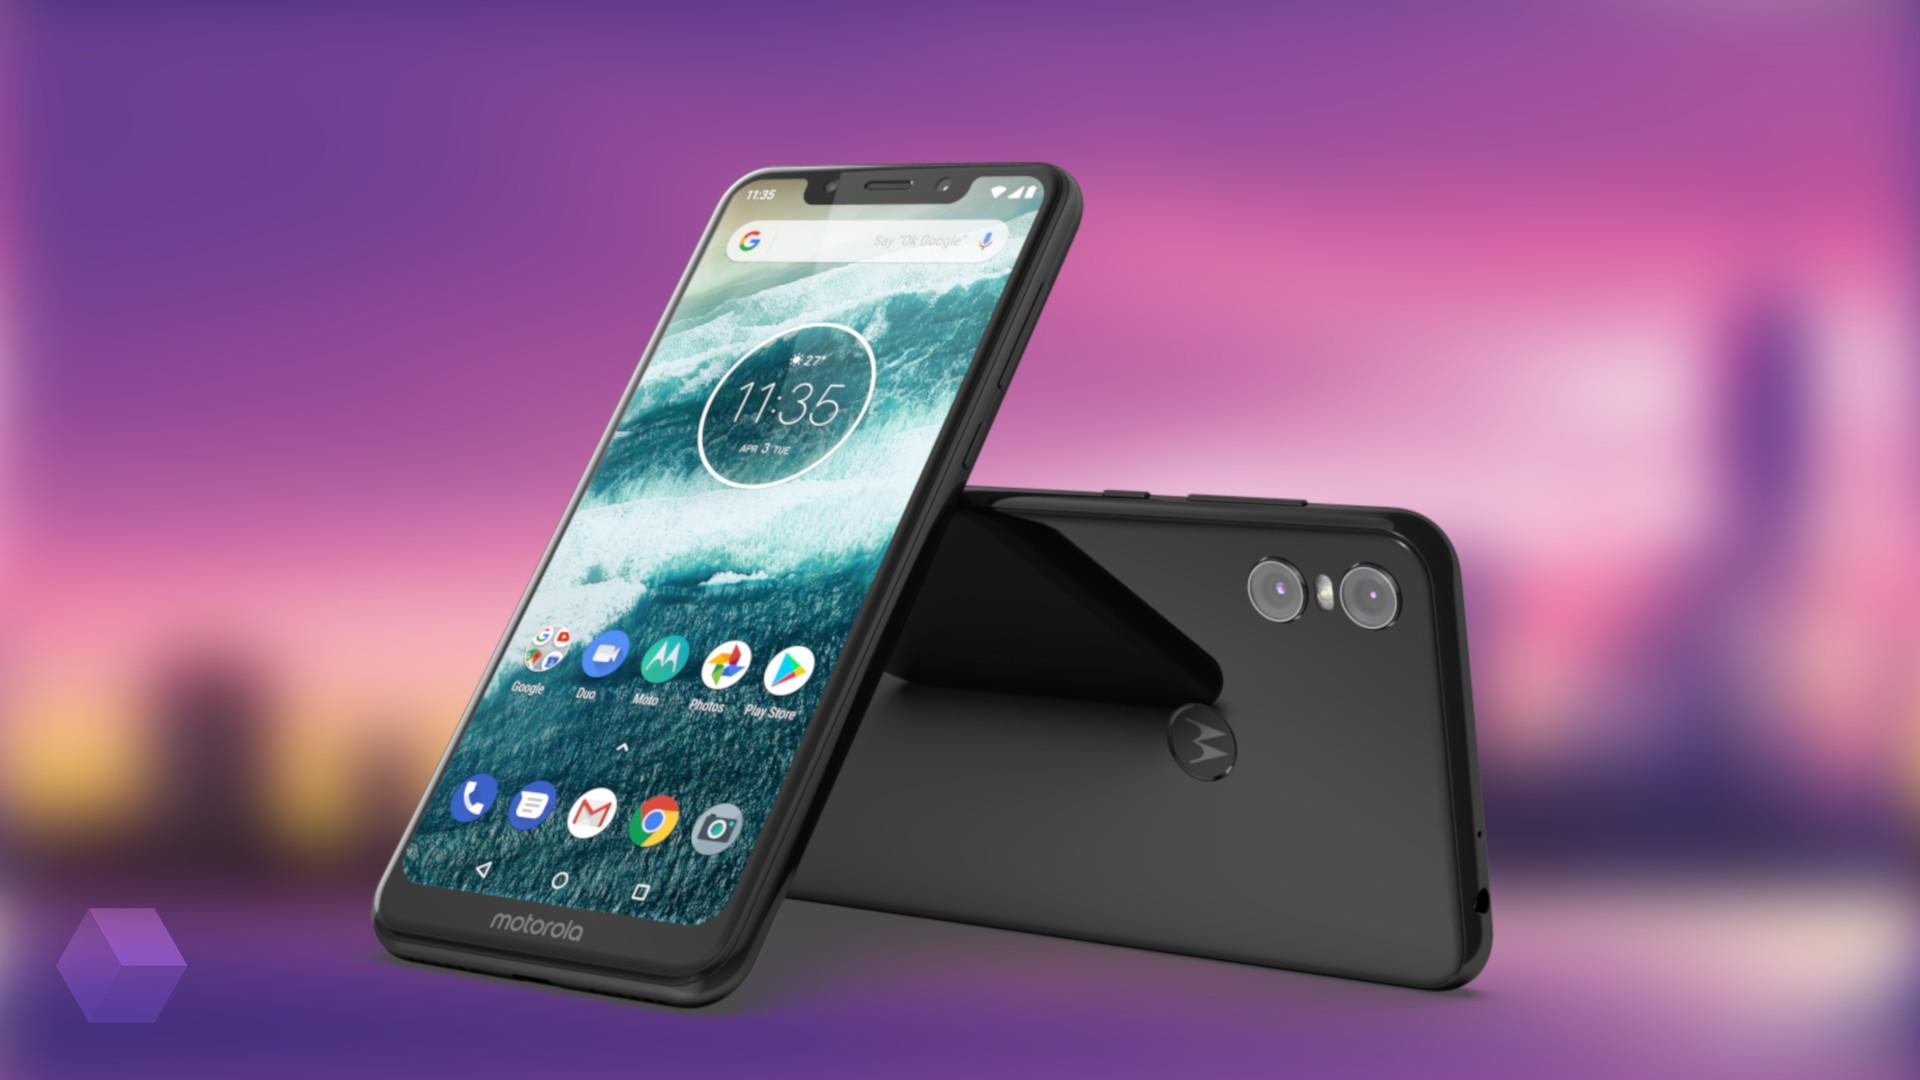 Motorola One и One Power—первые смартфоны бренда на Android One